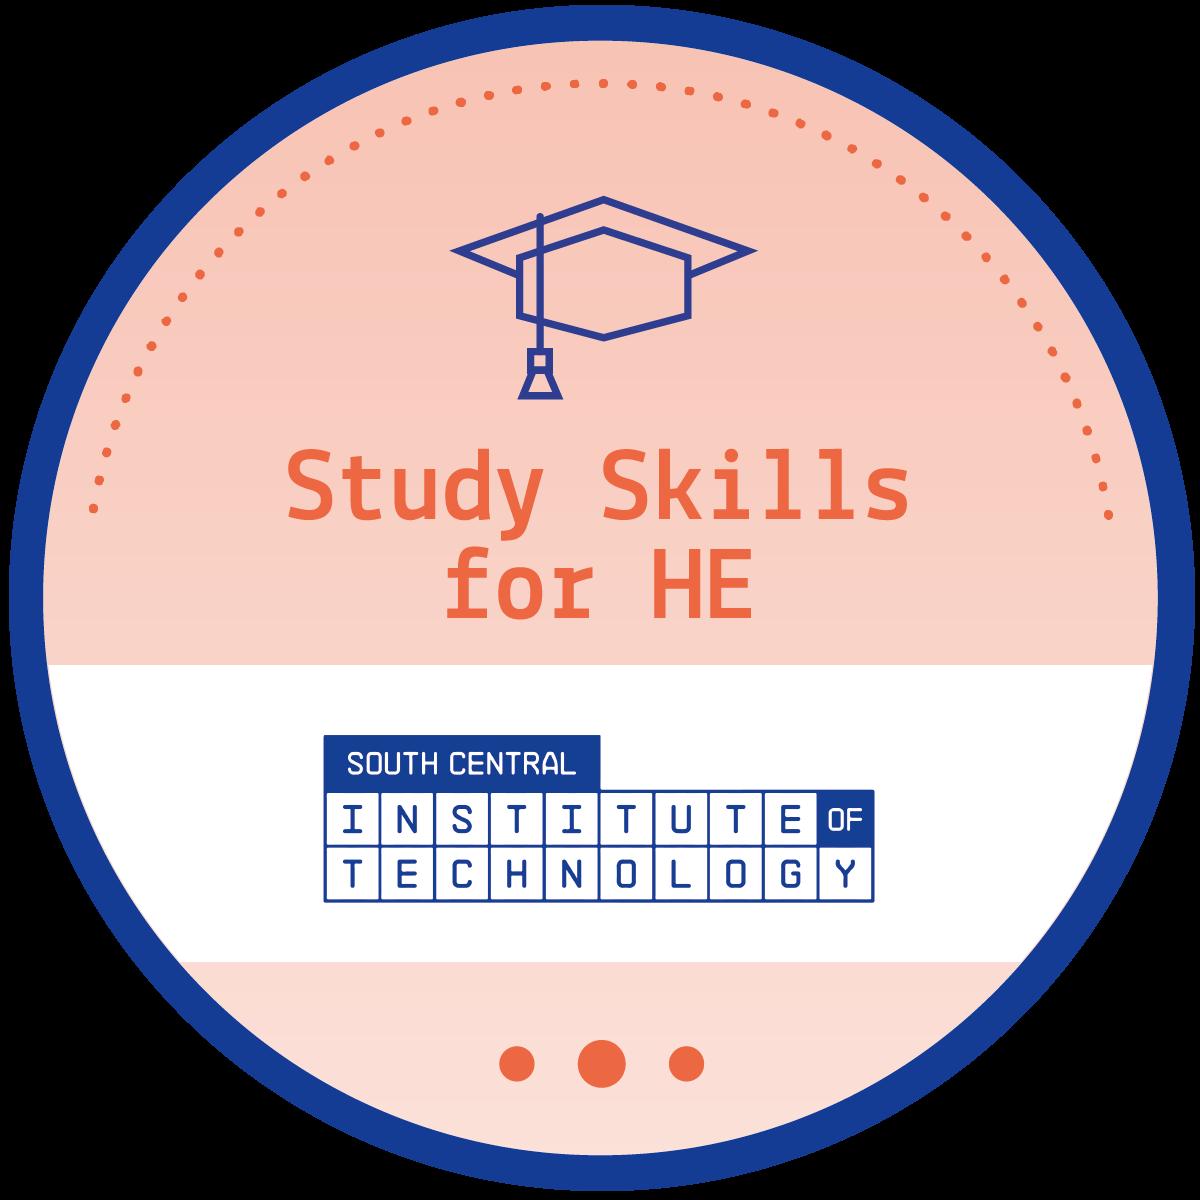 Study Skills for HE